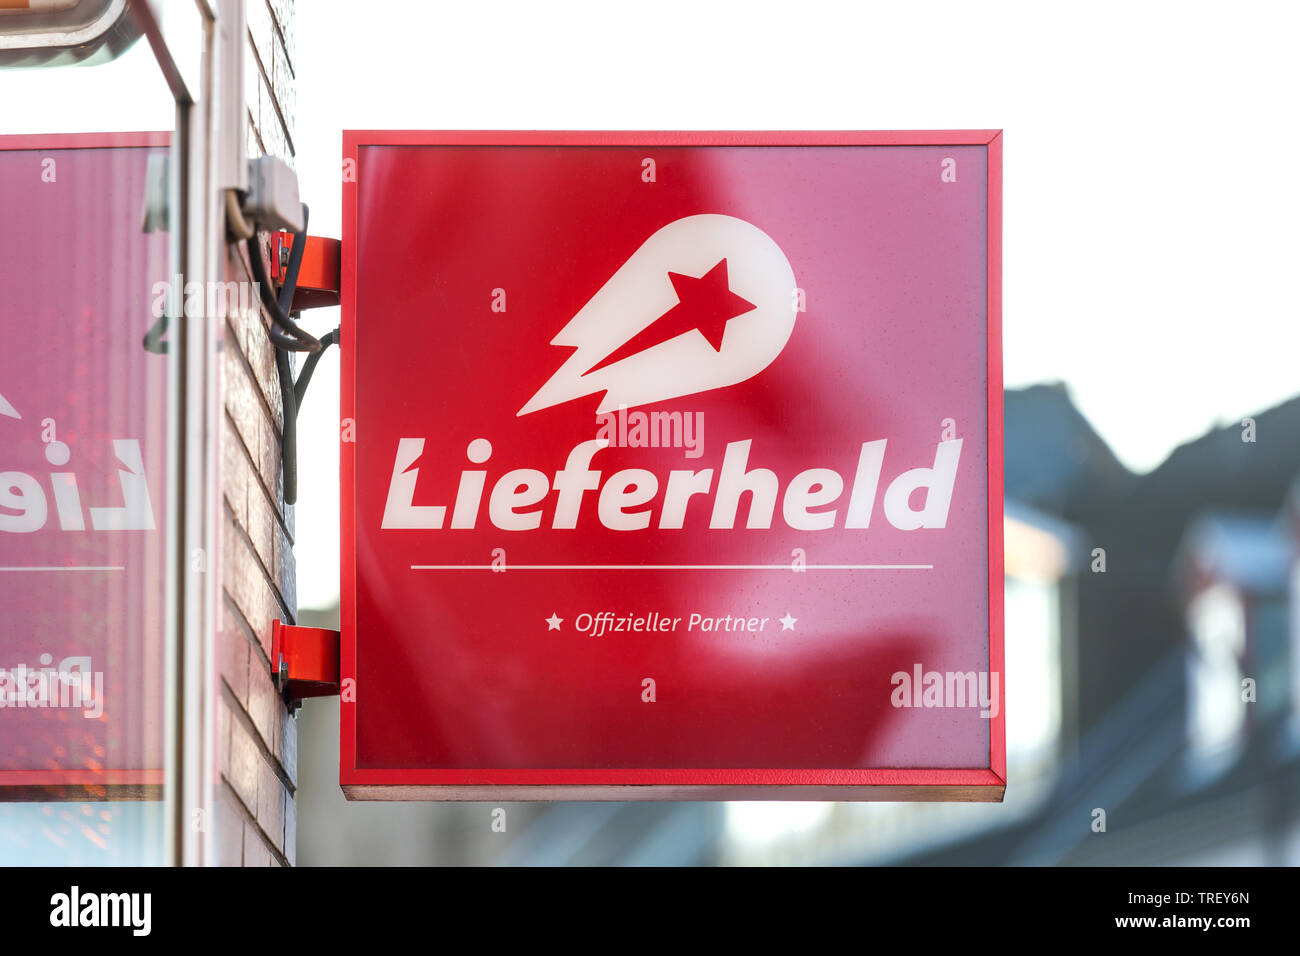 troisdorf, North Rhine-Westphalia/germany - 16 11 18: lieferheld sign in troisdorf germany - Stock Image